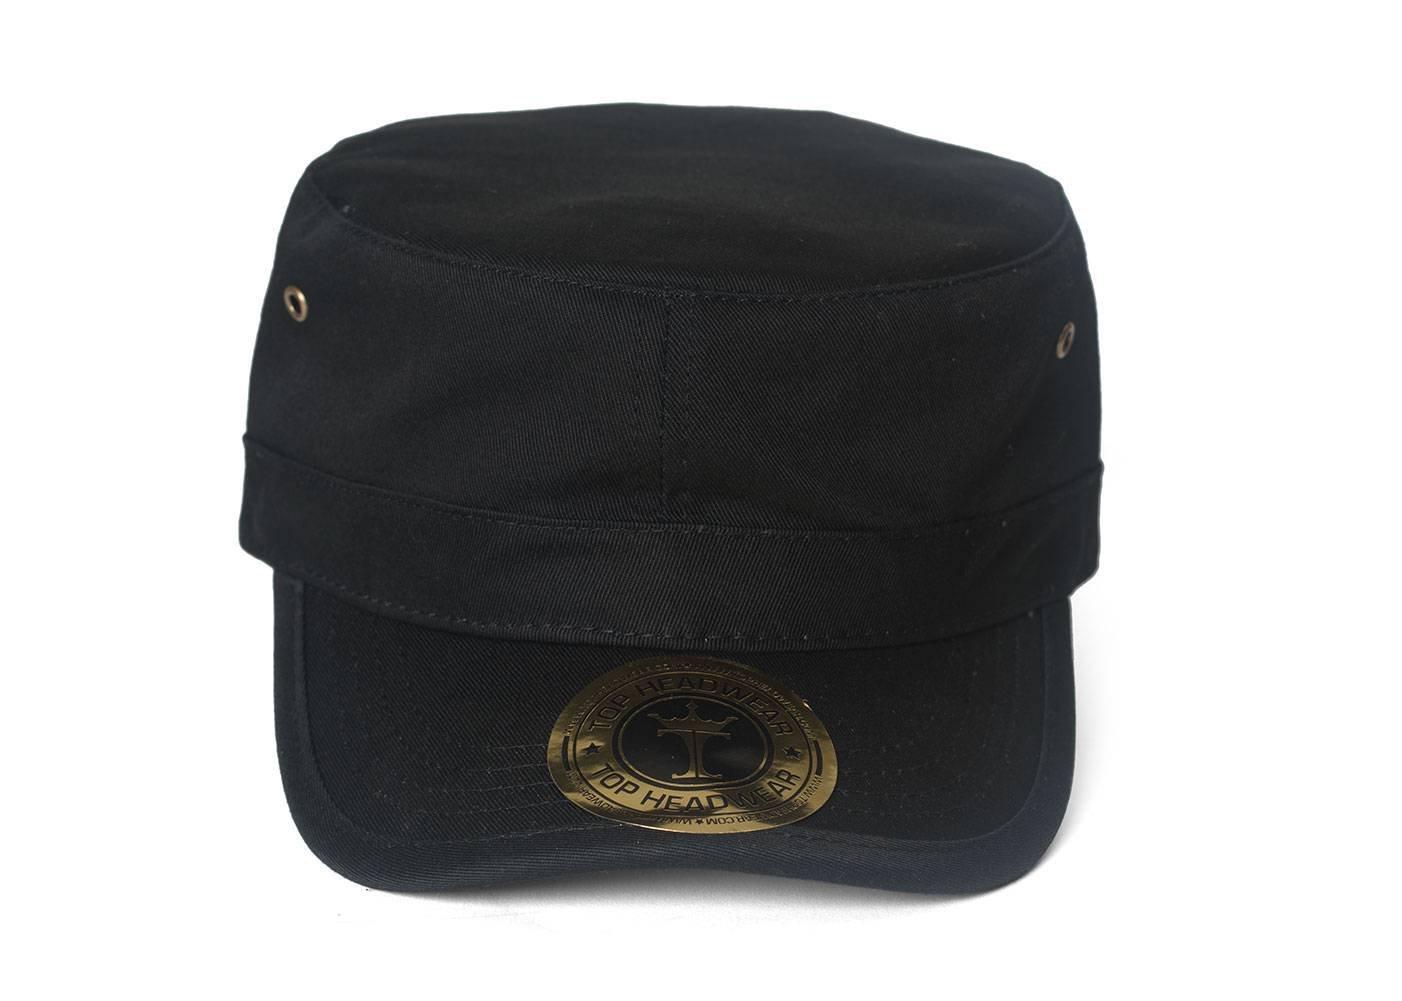 TopHeadwear Basic GI Adjustable Cadet Cap - Black TOP HEADWEAR